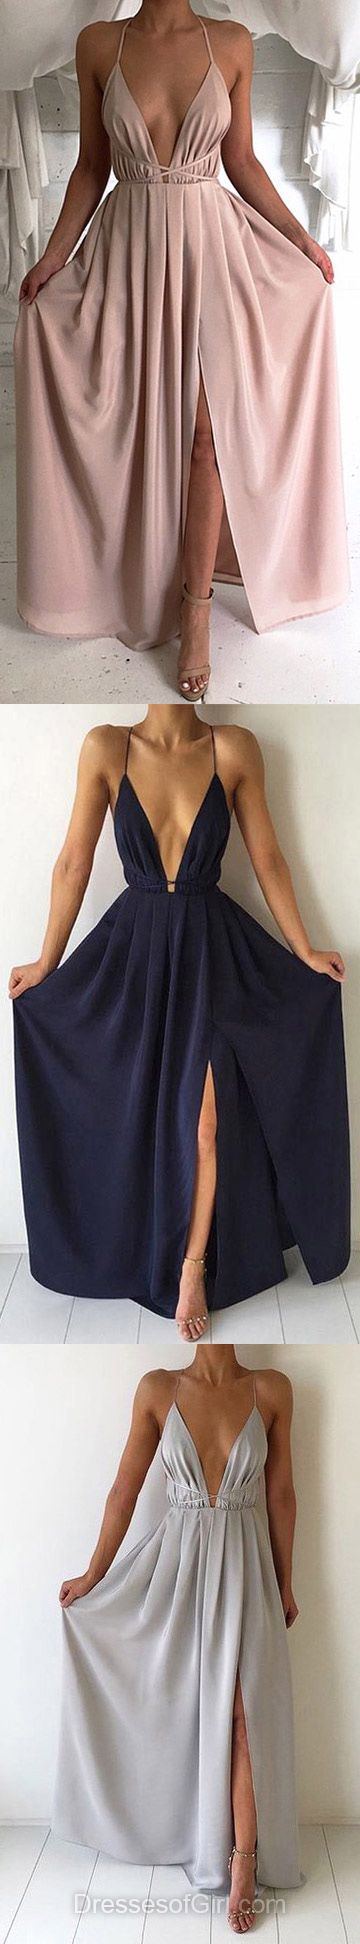 Sheath/Column V-neck Chiffon Floor-length Split Front Backless Hot Prom Dresses